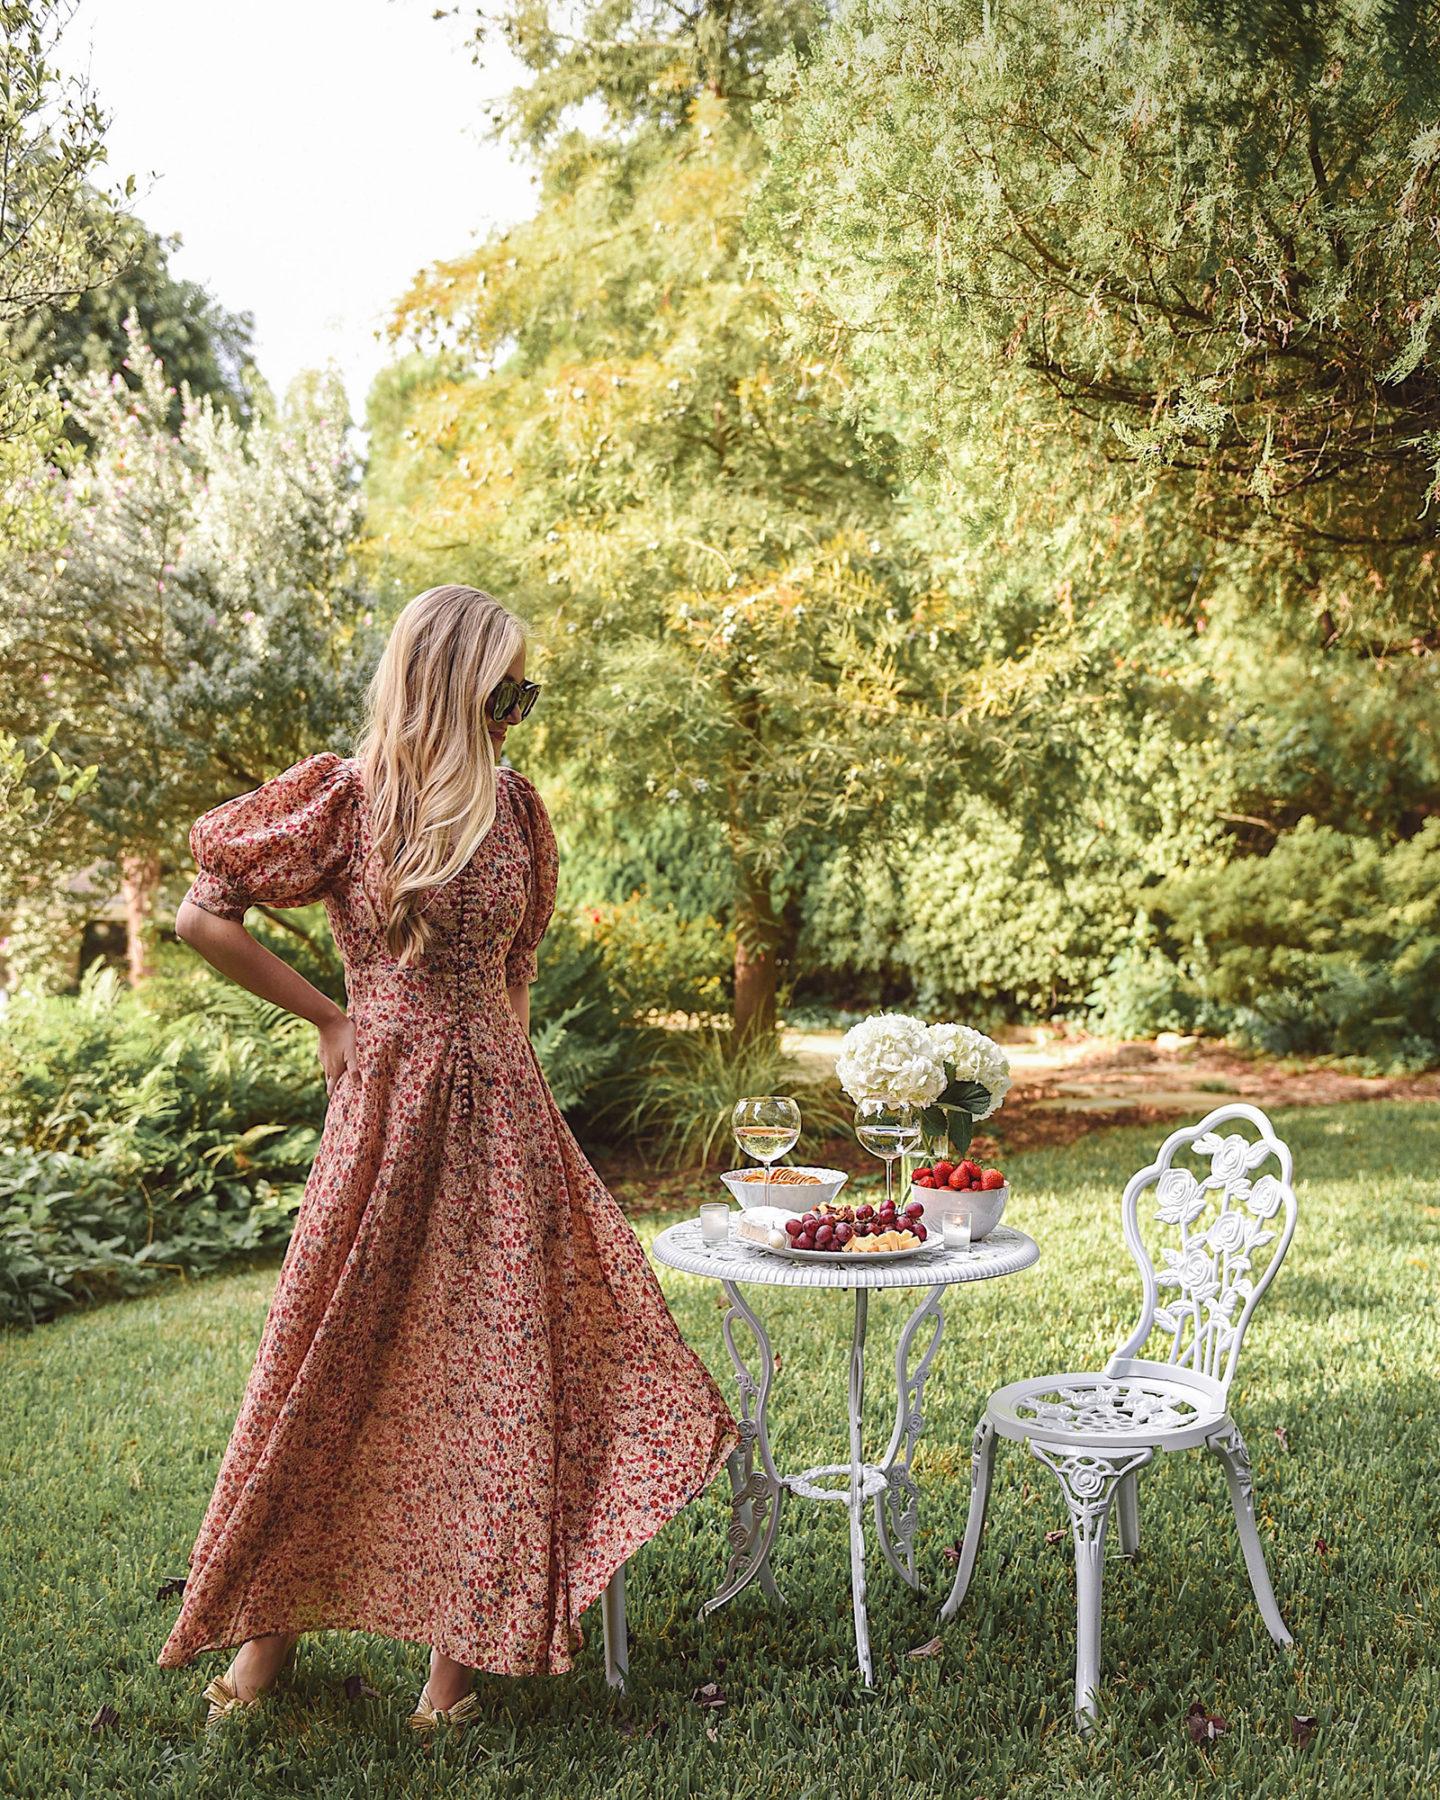 Lo-Murphy-Walmart-Cheeseboard-Date-Night-dallas-blogger-outdoor-furniture-Doen-Dress-fall-dress-floral-dress